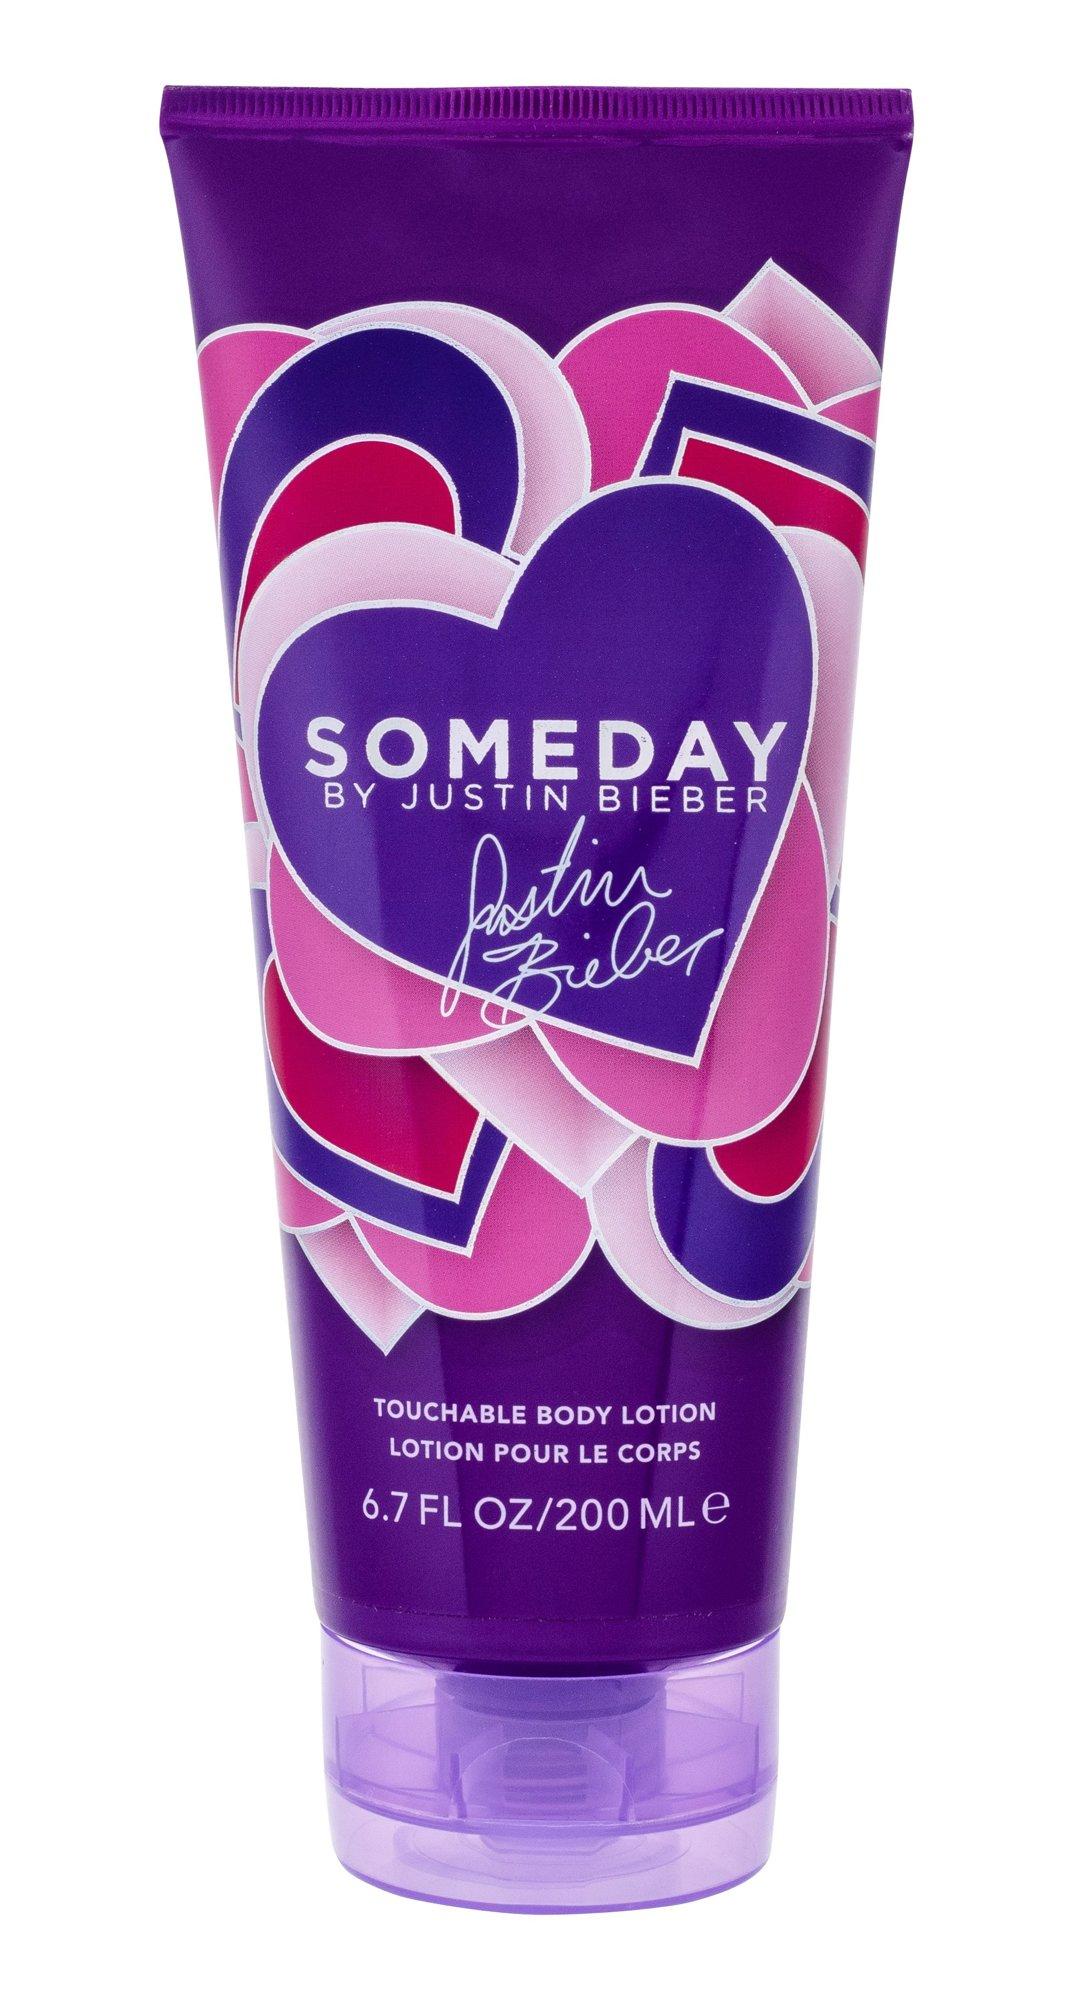 Justin Bieber Someday Body lotion 200ml